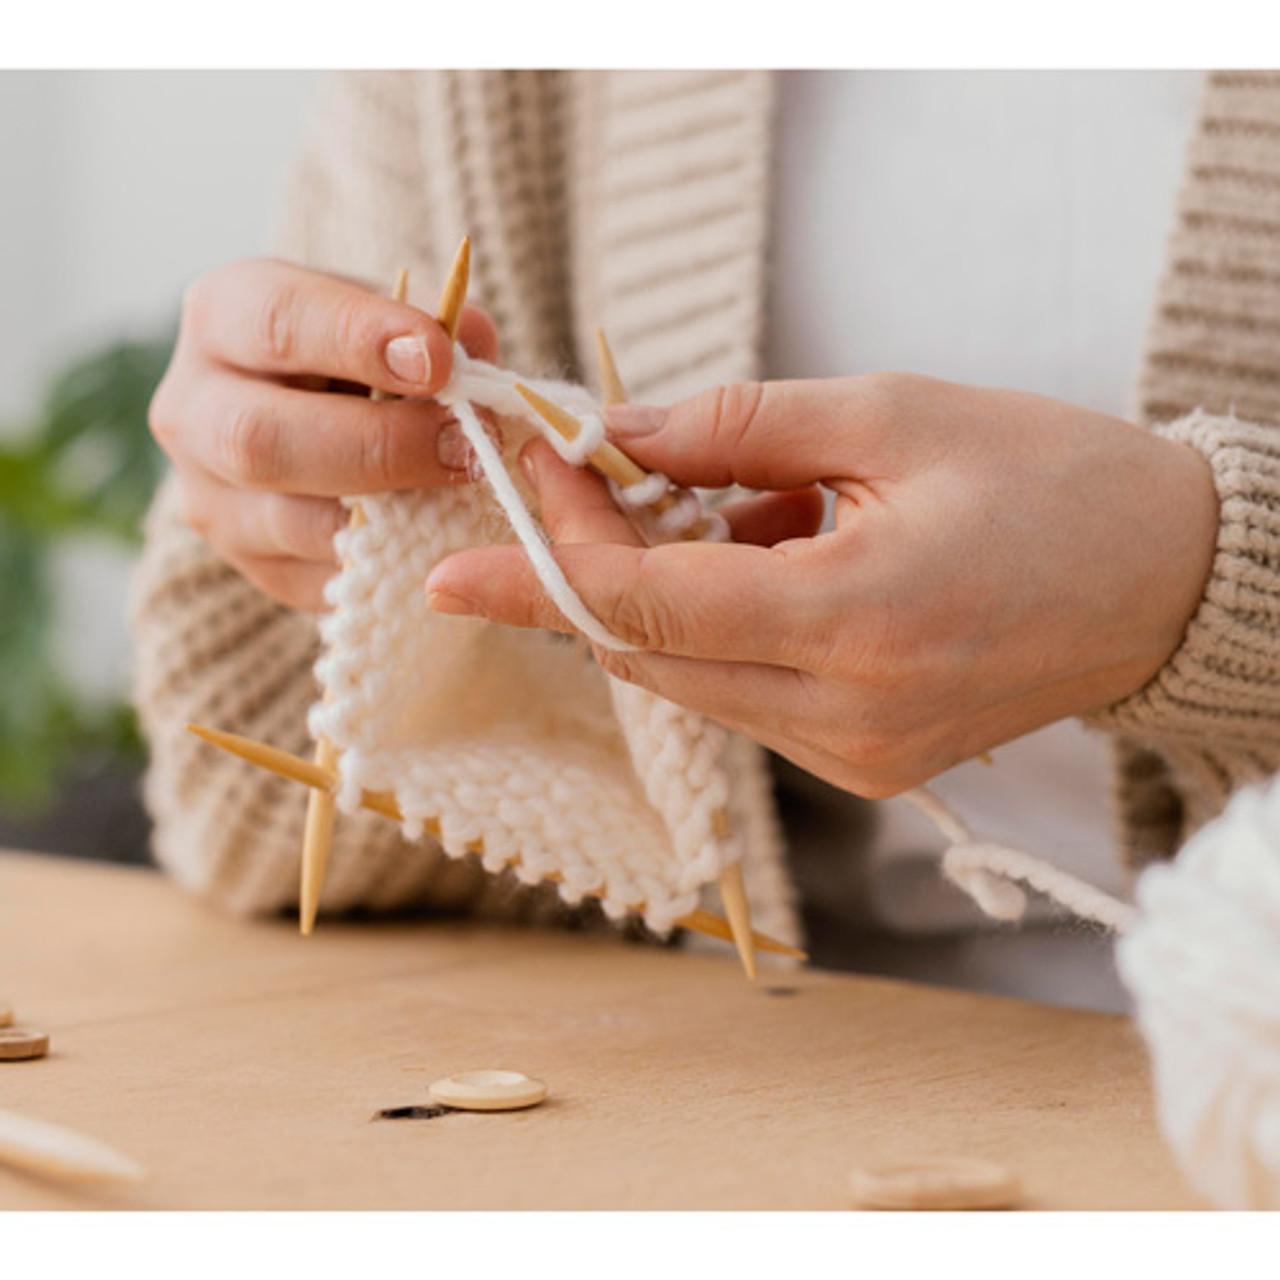 Double Point Knitting Needles